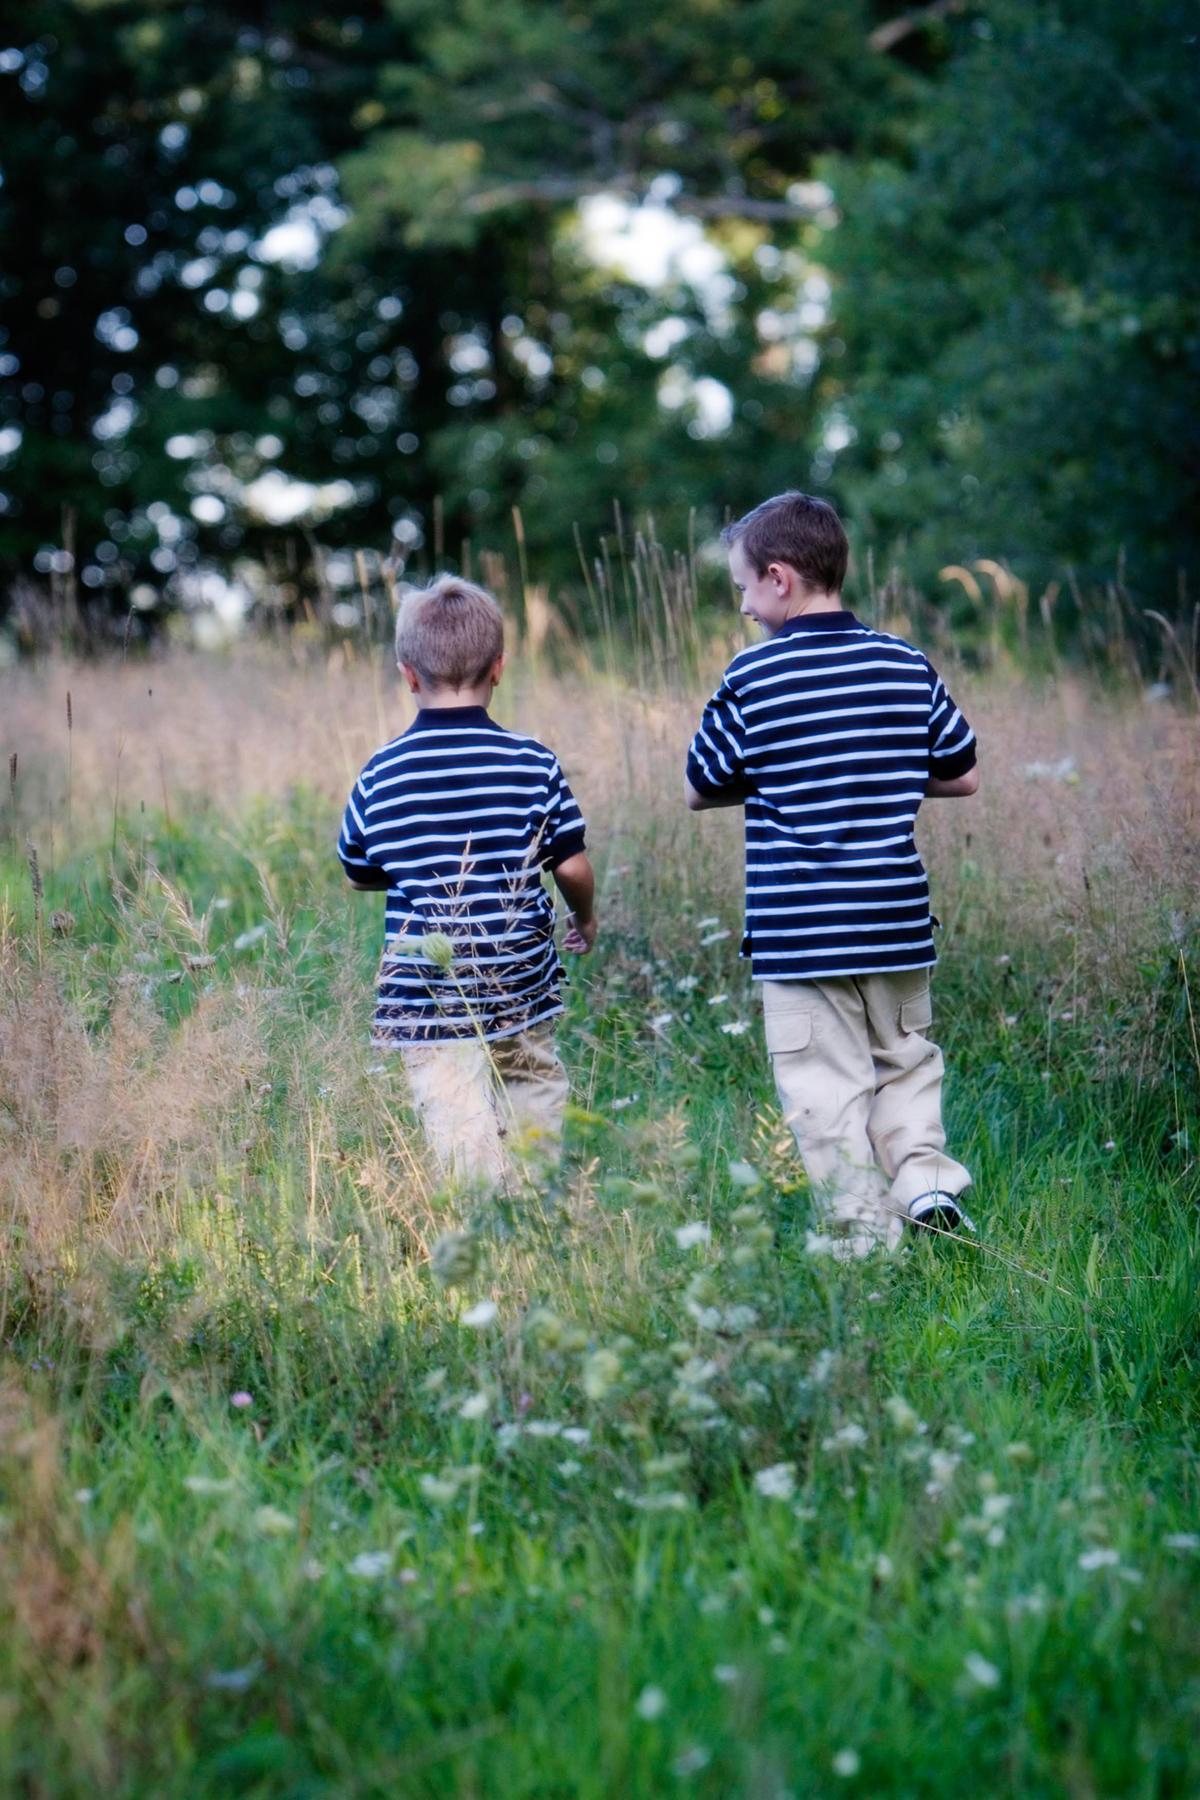 Children_008.jpg